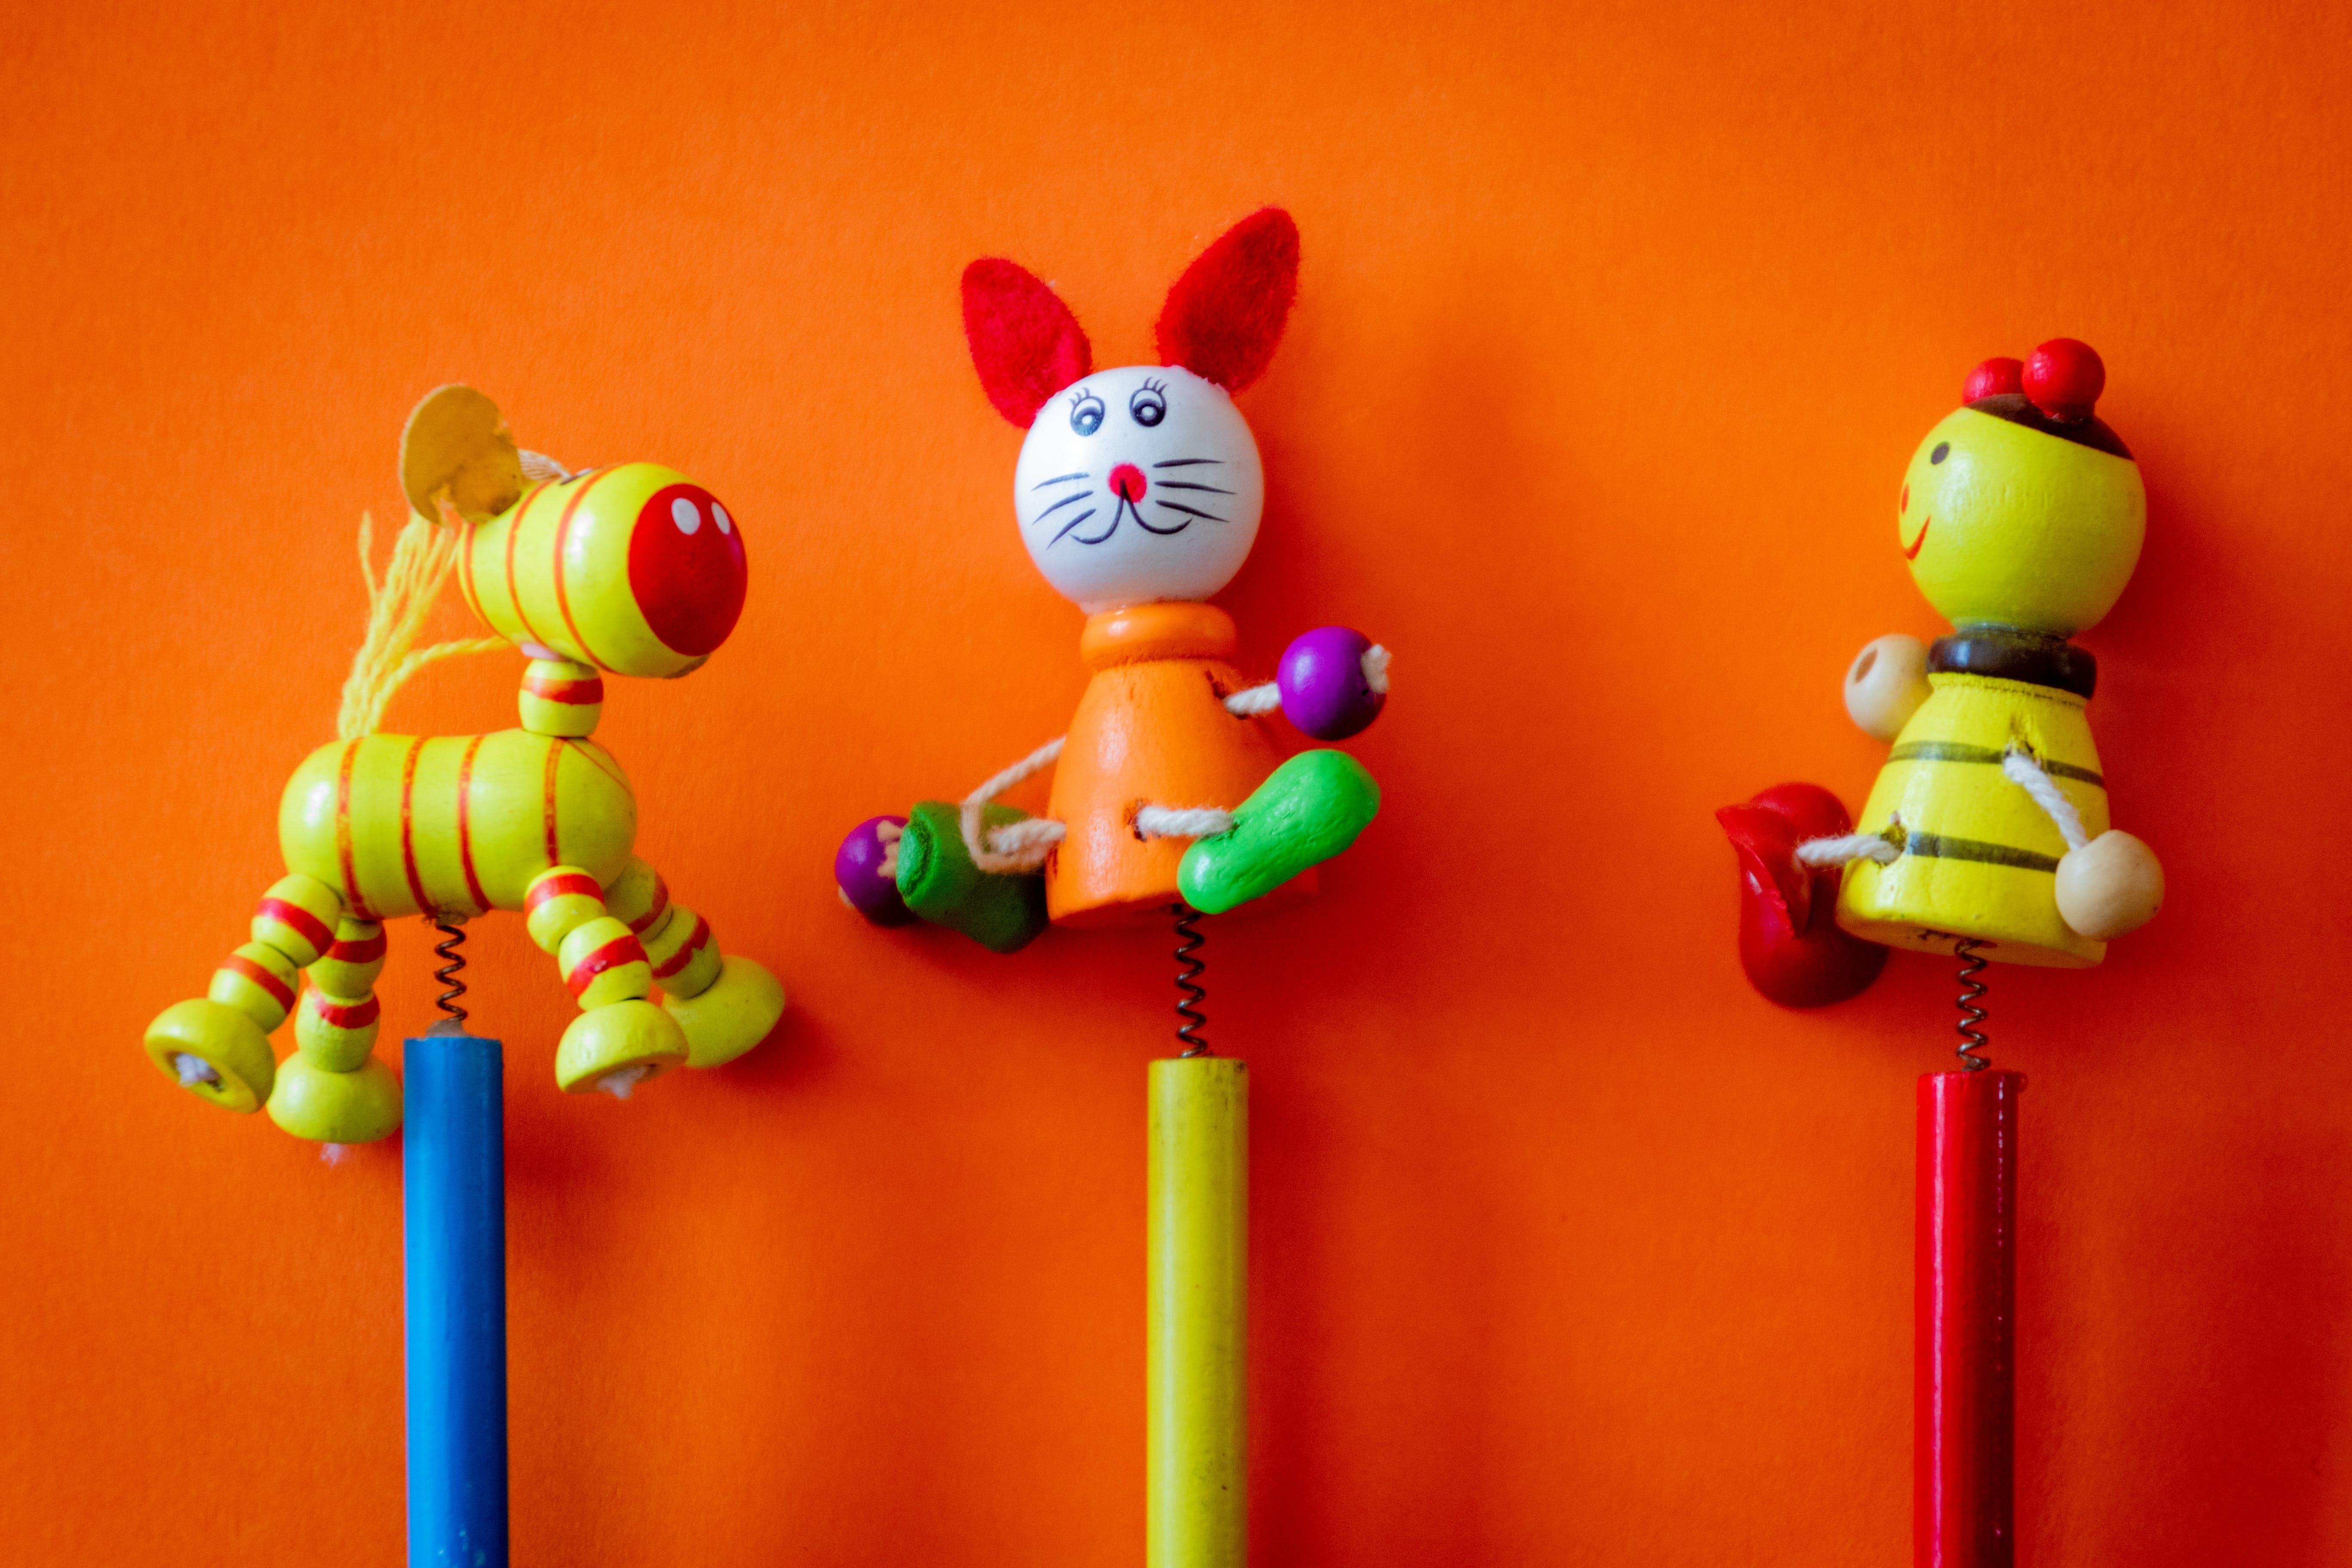 Three Yellow, Orange, and Black Toy Sticks